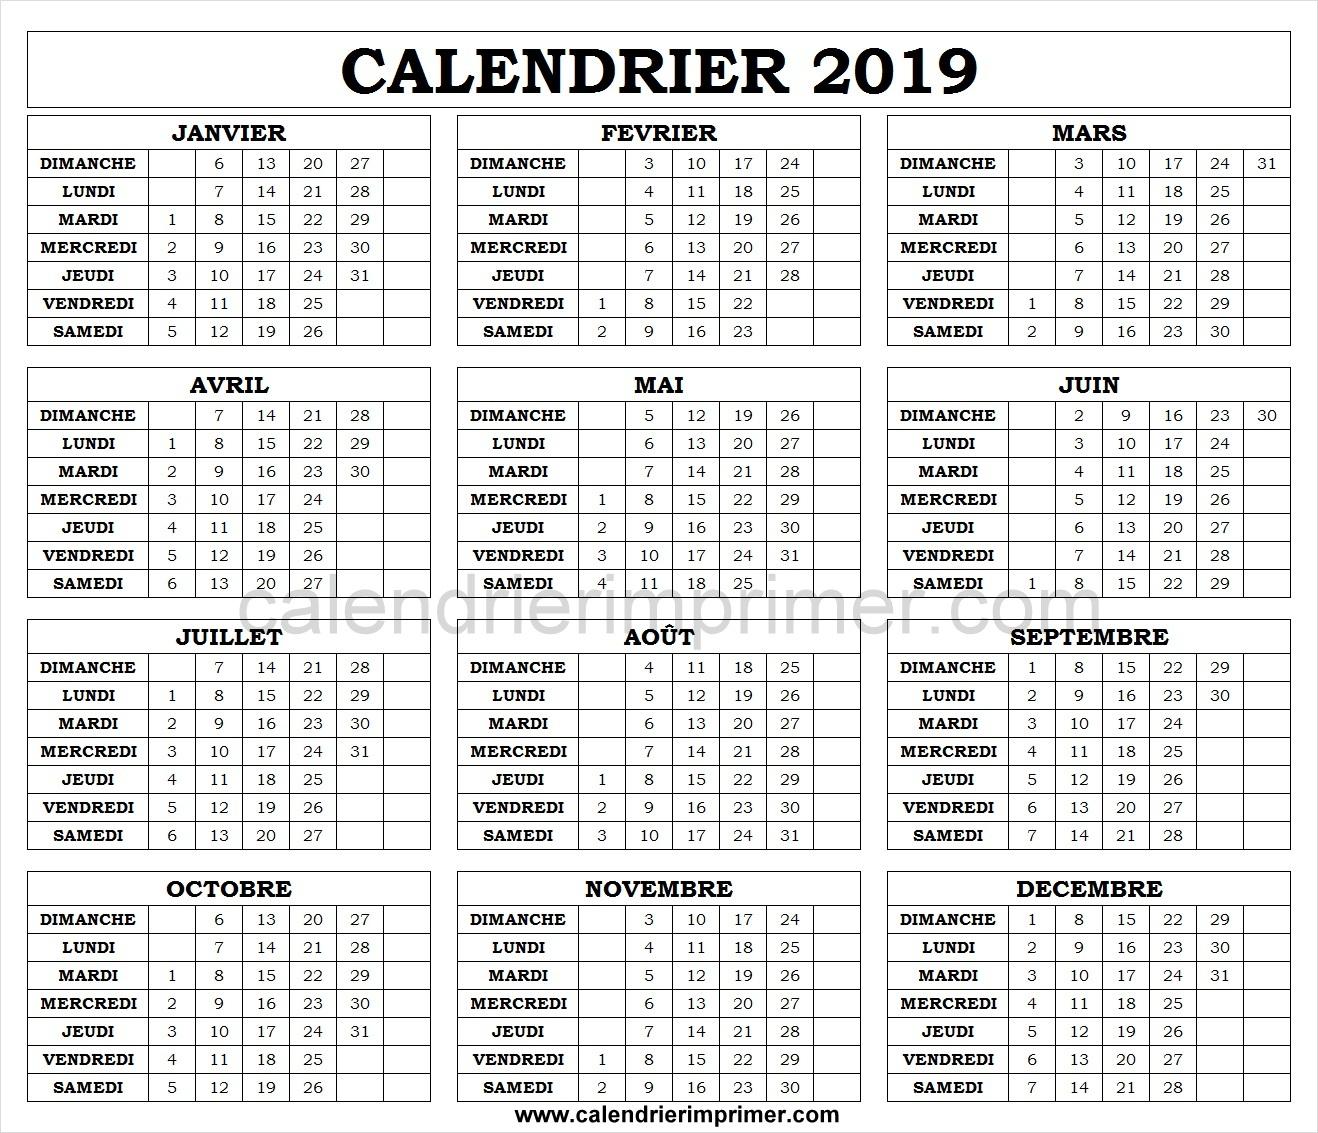 Calendrier 2019 Ludique A Imprimer | Calendrier Vacances 2019 encequiconcerne Calendrier Ludique À Imprimer